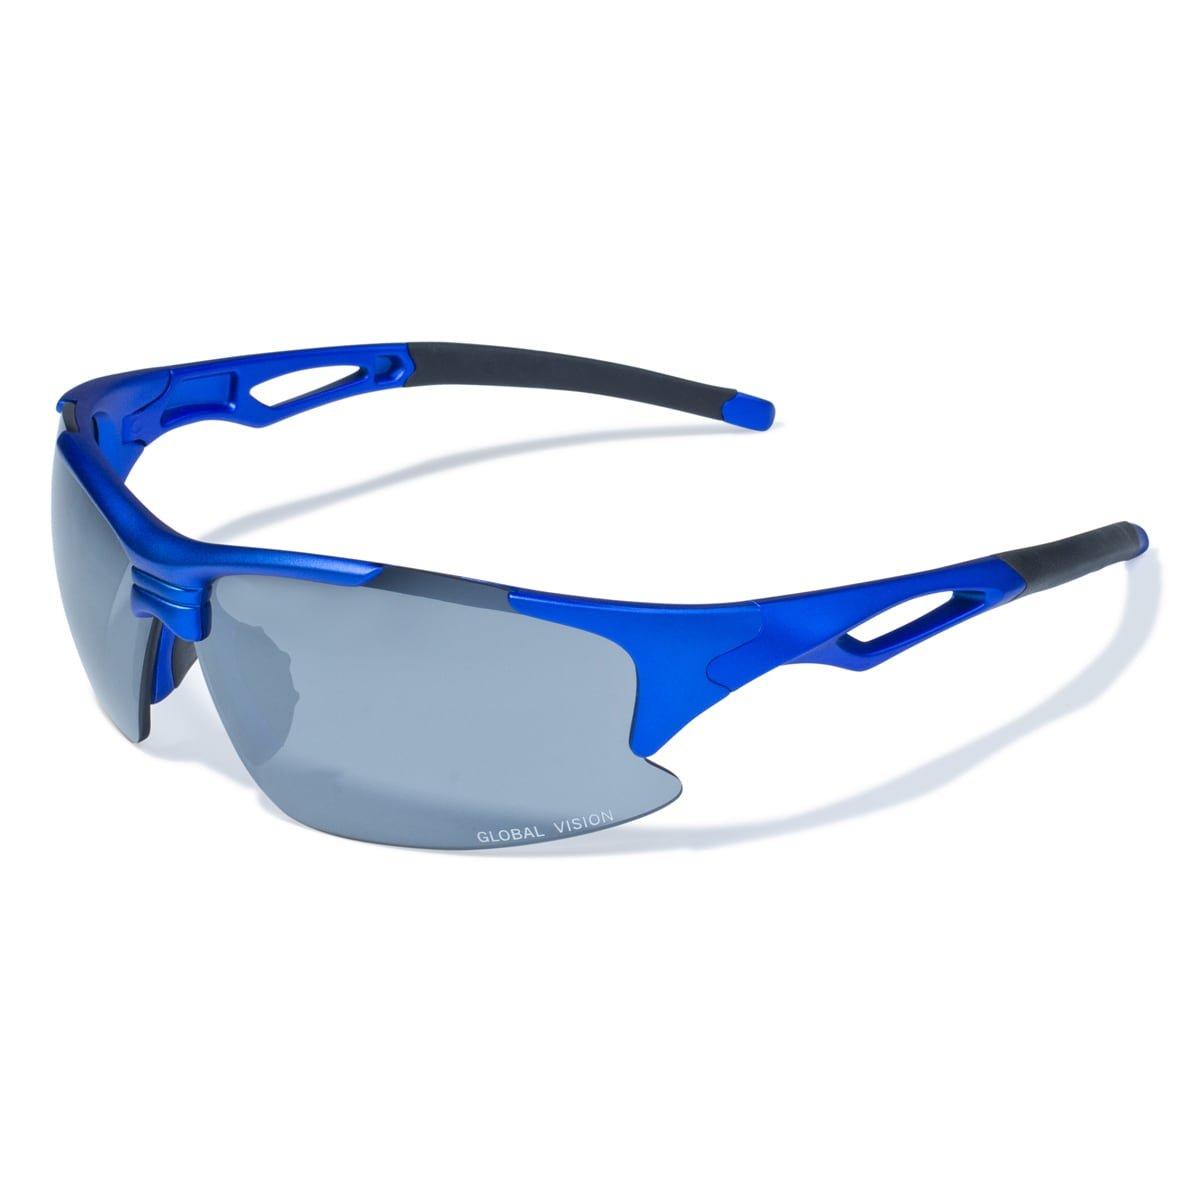 c303fe5221 Amazon.com  Global Vision Eyewear Men s  Friday  Blue Lens Sport Sunglasses   Clothing